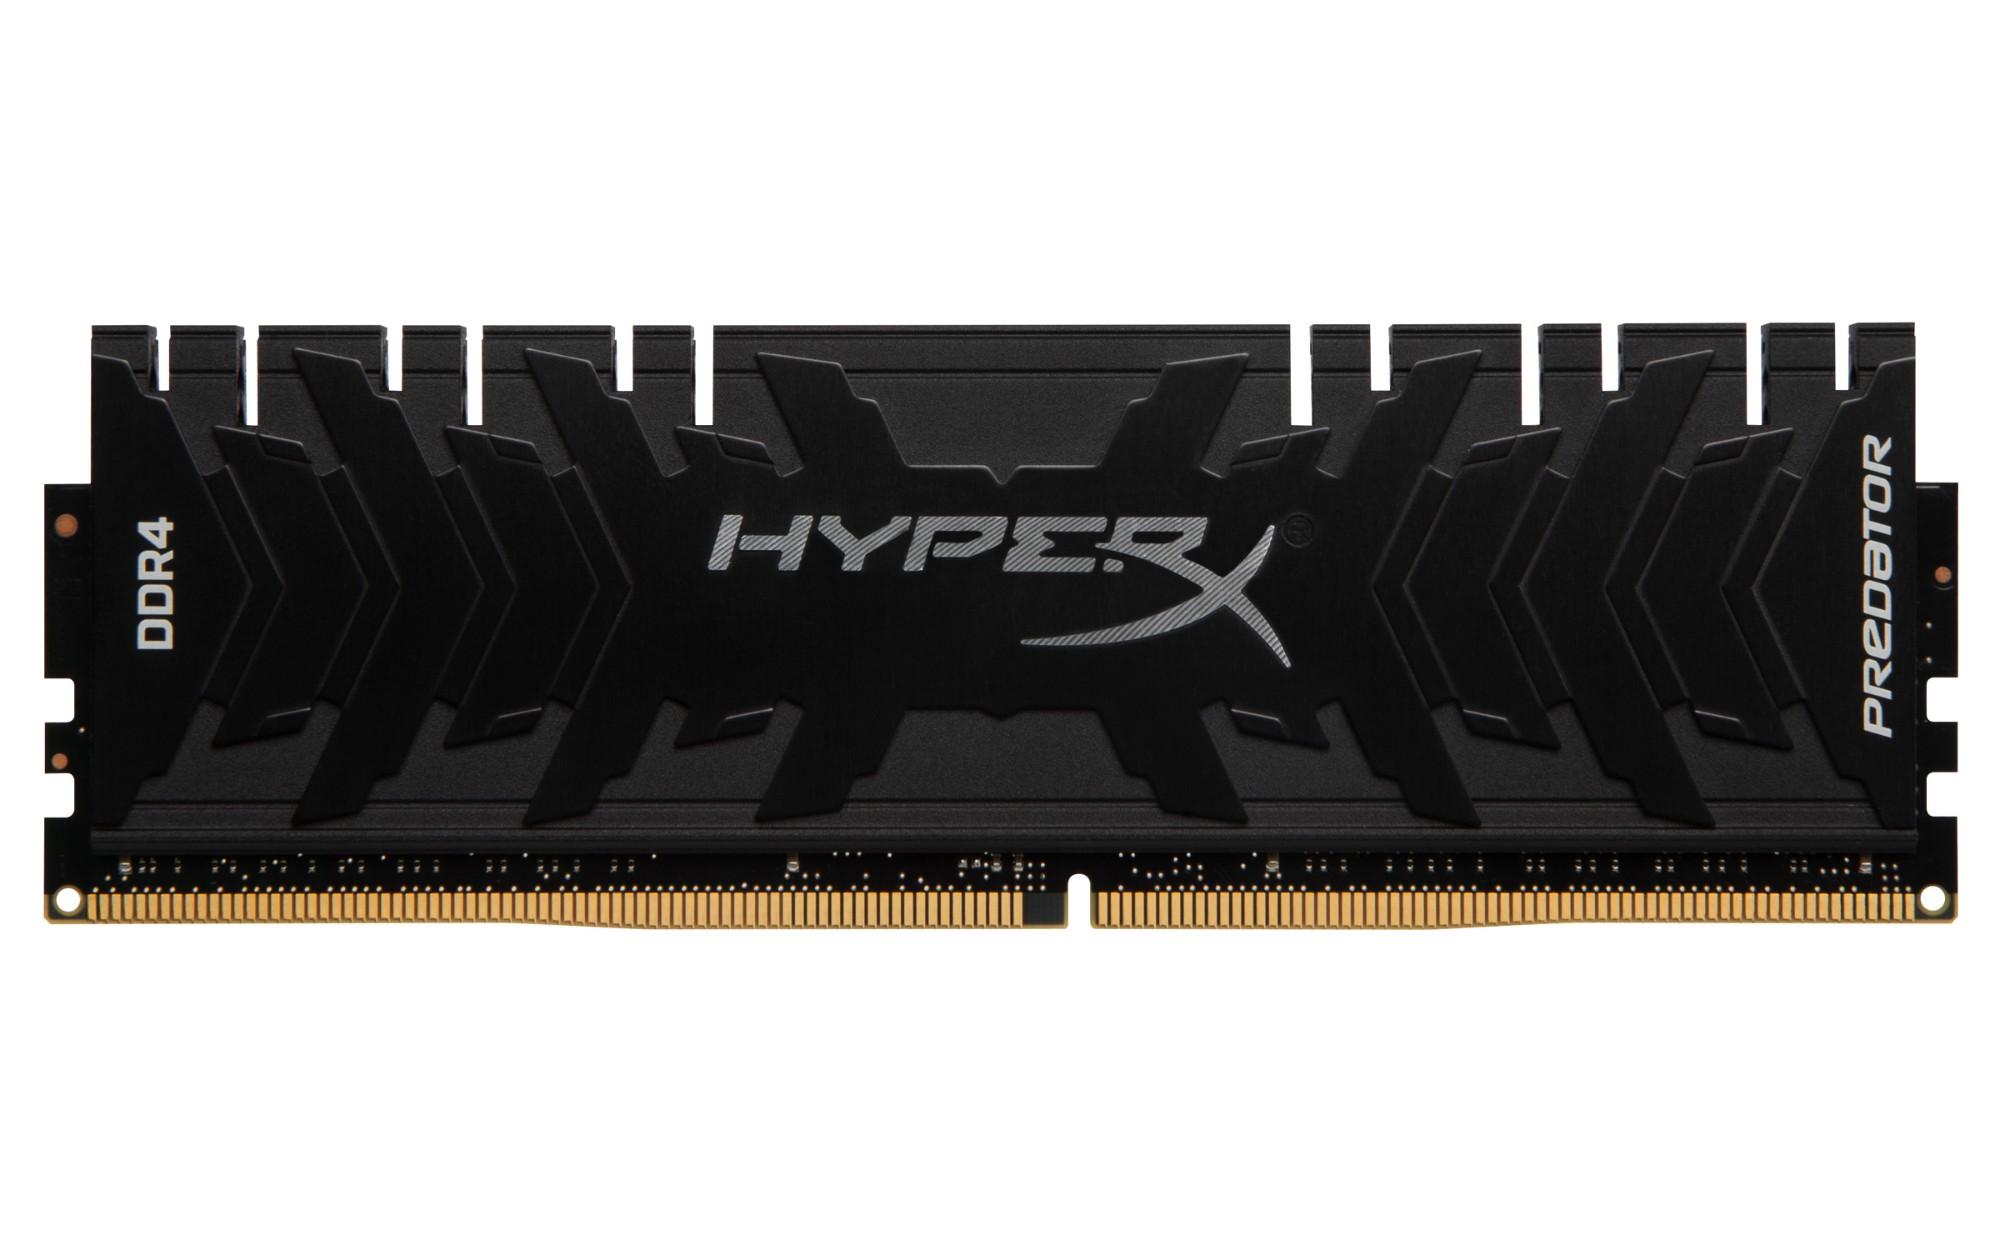 HYPERX PREDATOR HX440C19PB3K2/16 MEMORY MODULE 16 GB DDR4 4000 MHZ